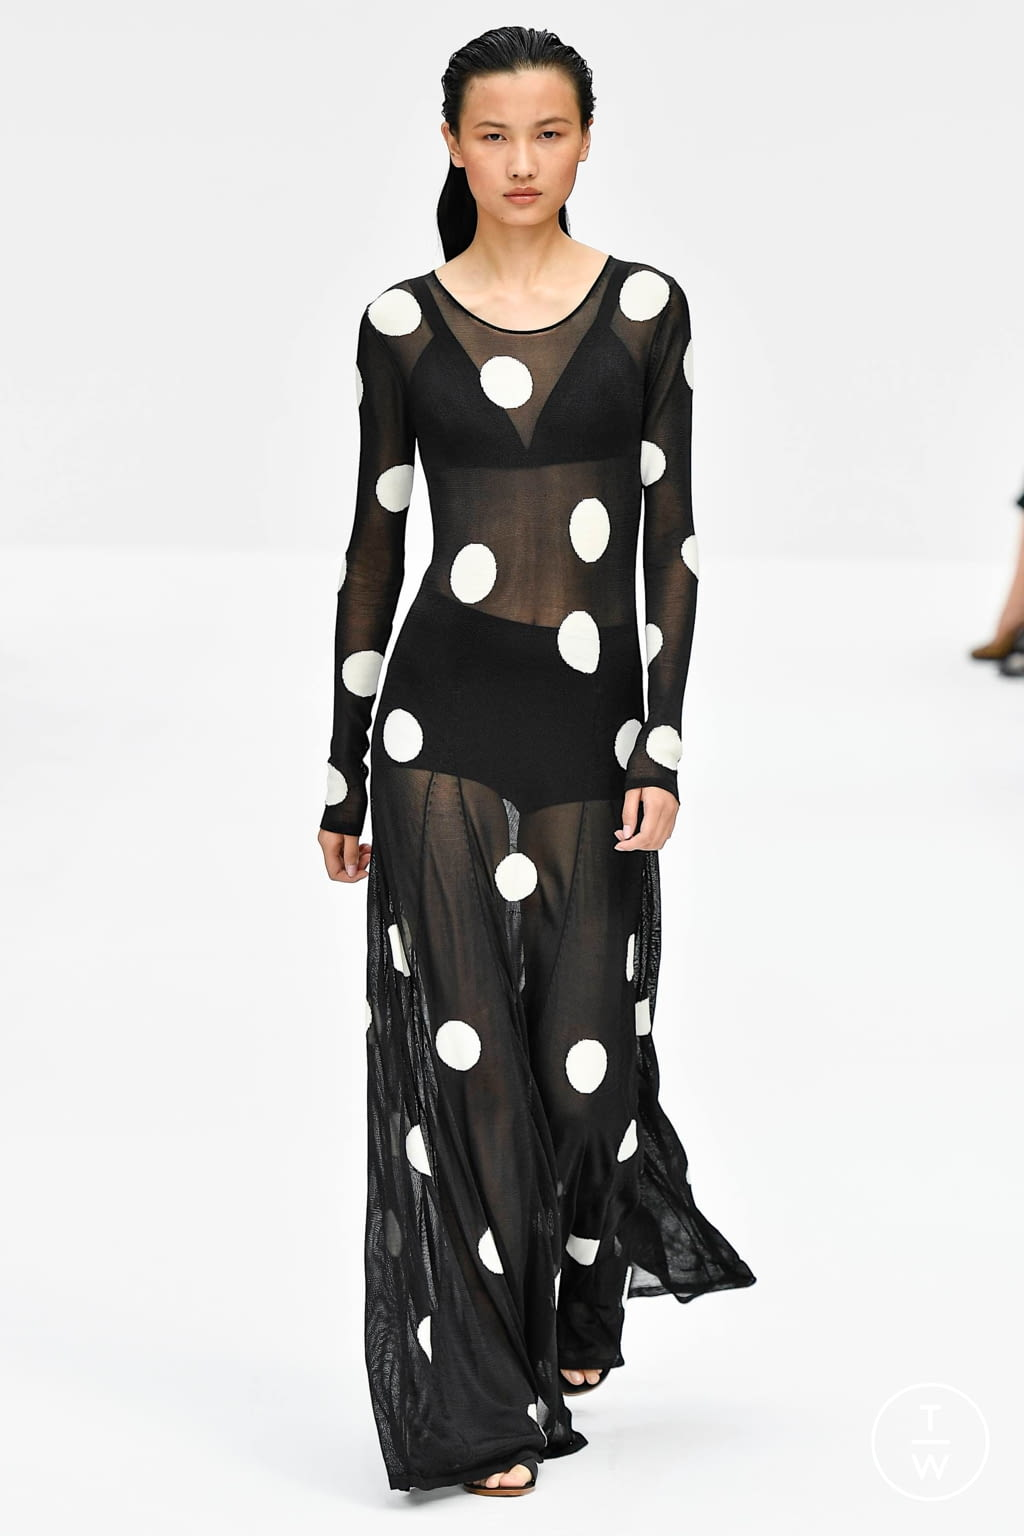 Fashion Week New York Spring/Summer 2020 look 24 from the Carolina Herrera collection womenswear